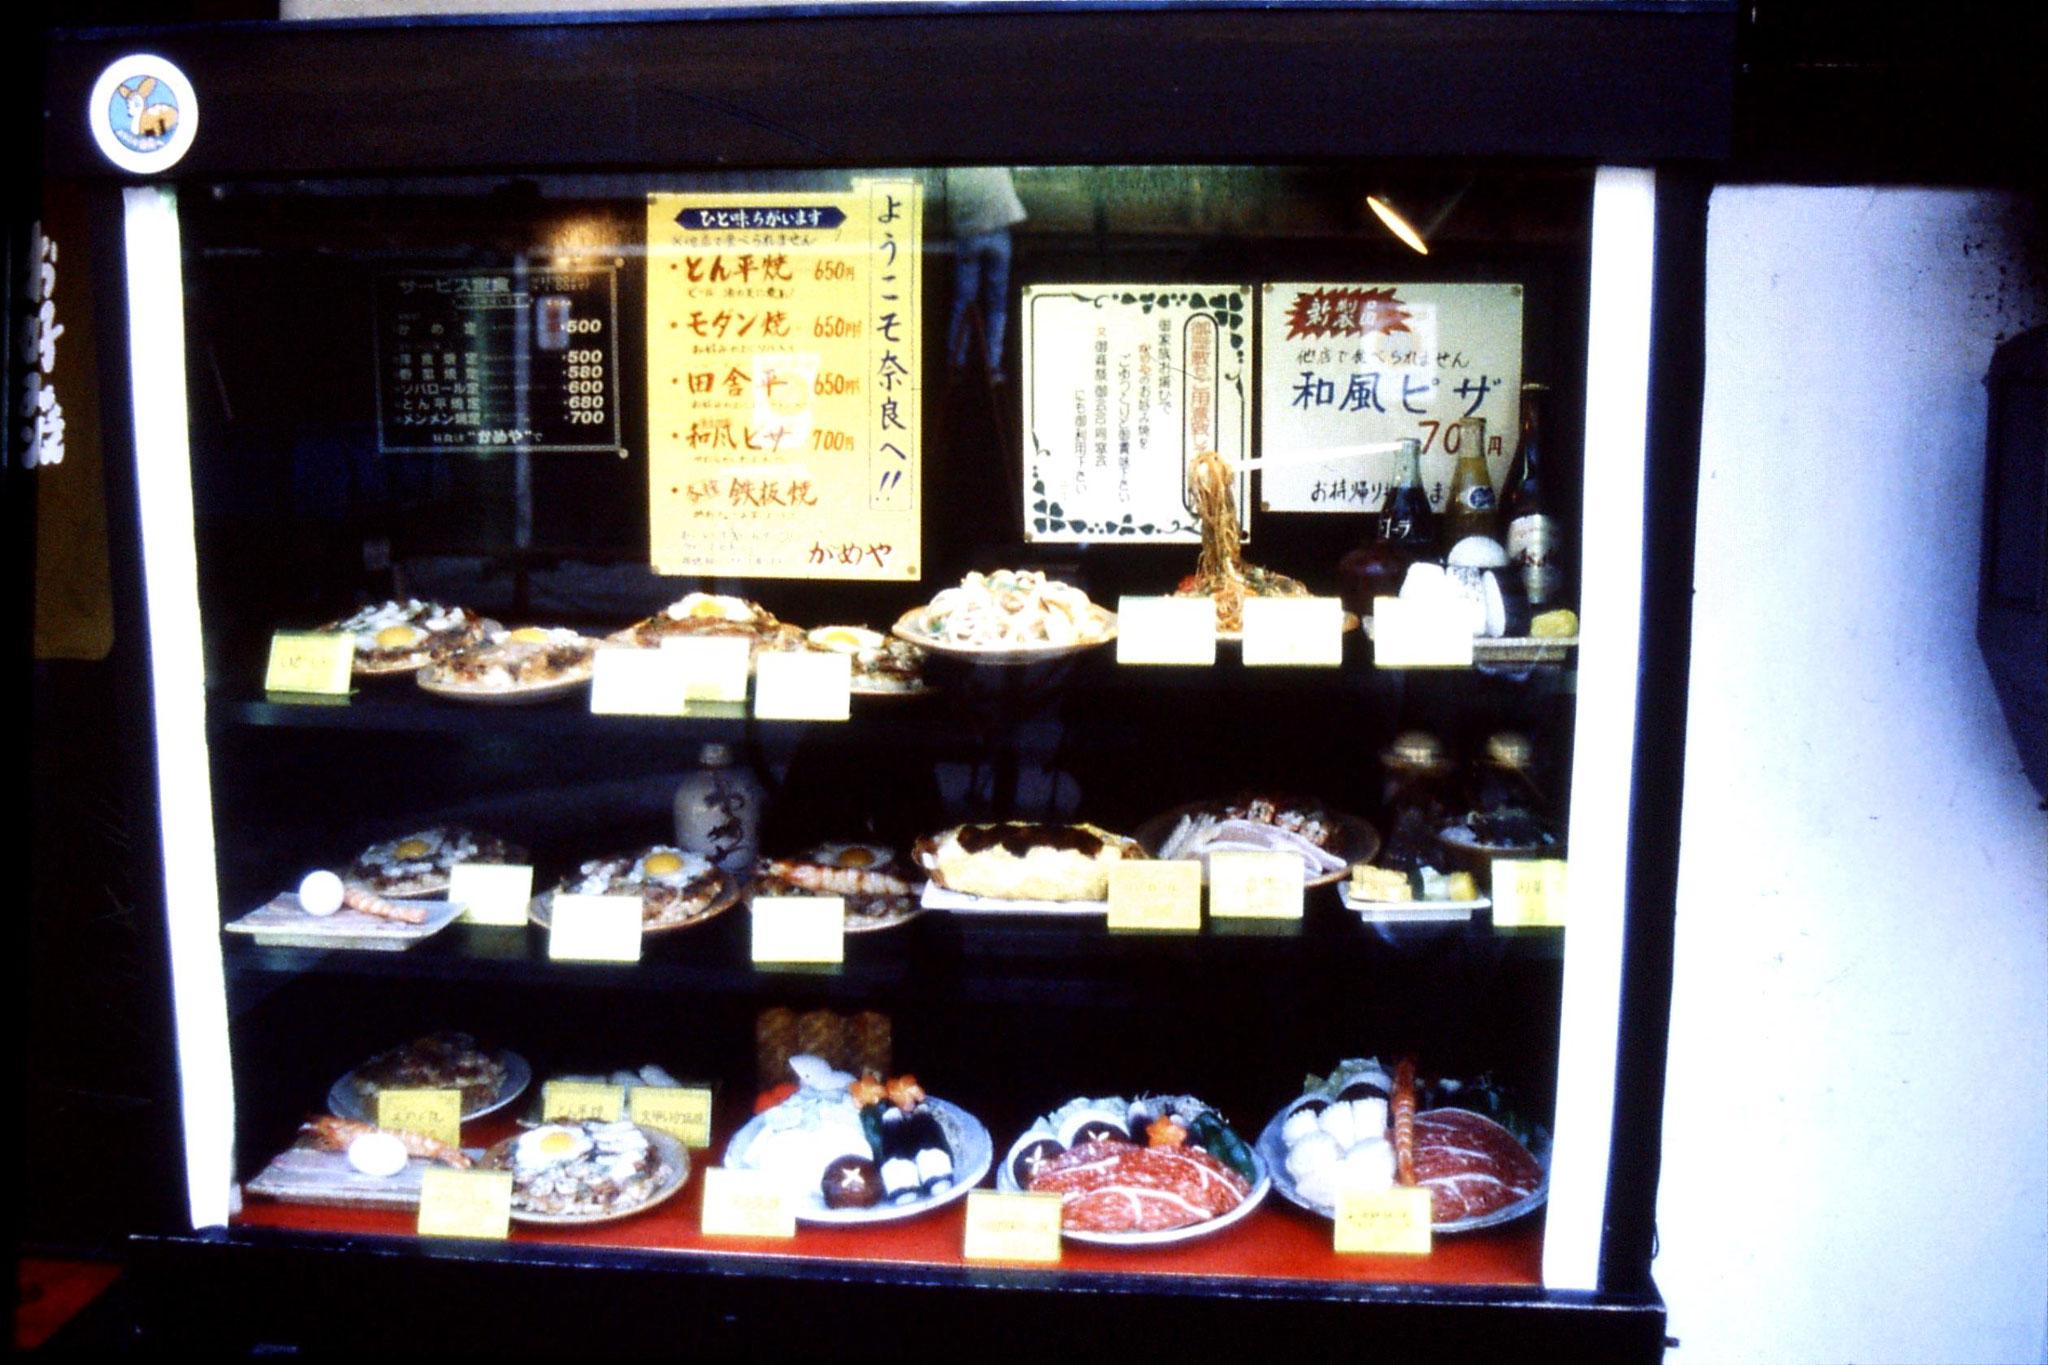 26/1/1989: 4:  Kyoto